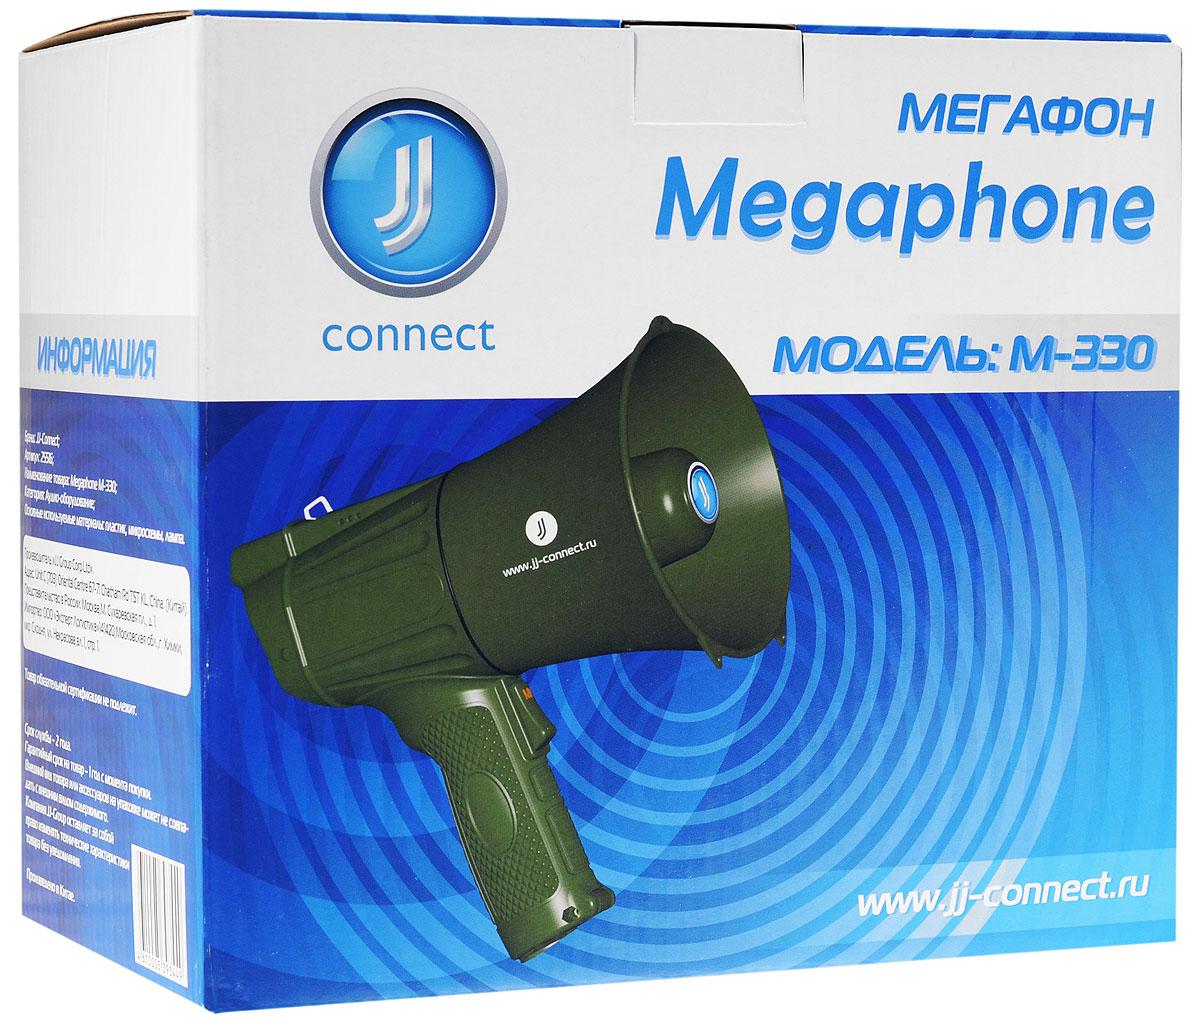 Мегафон JJ-Connect M-330